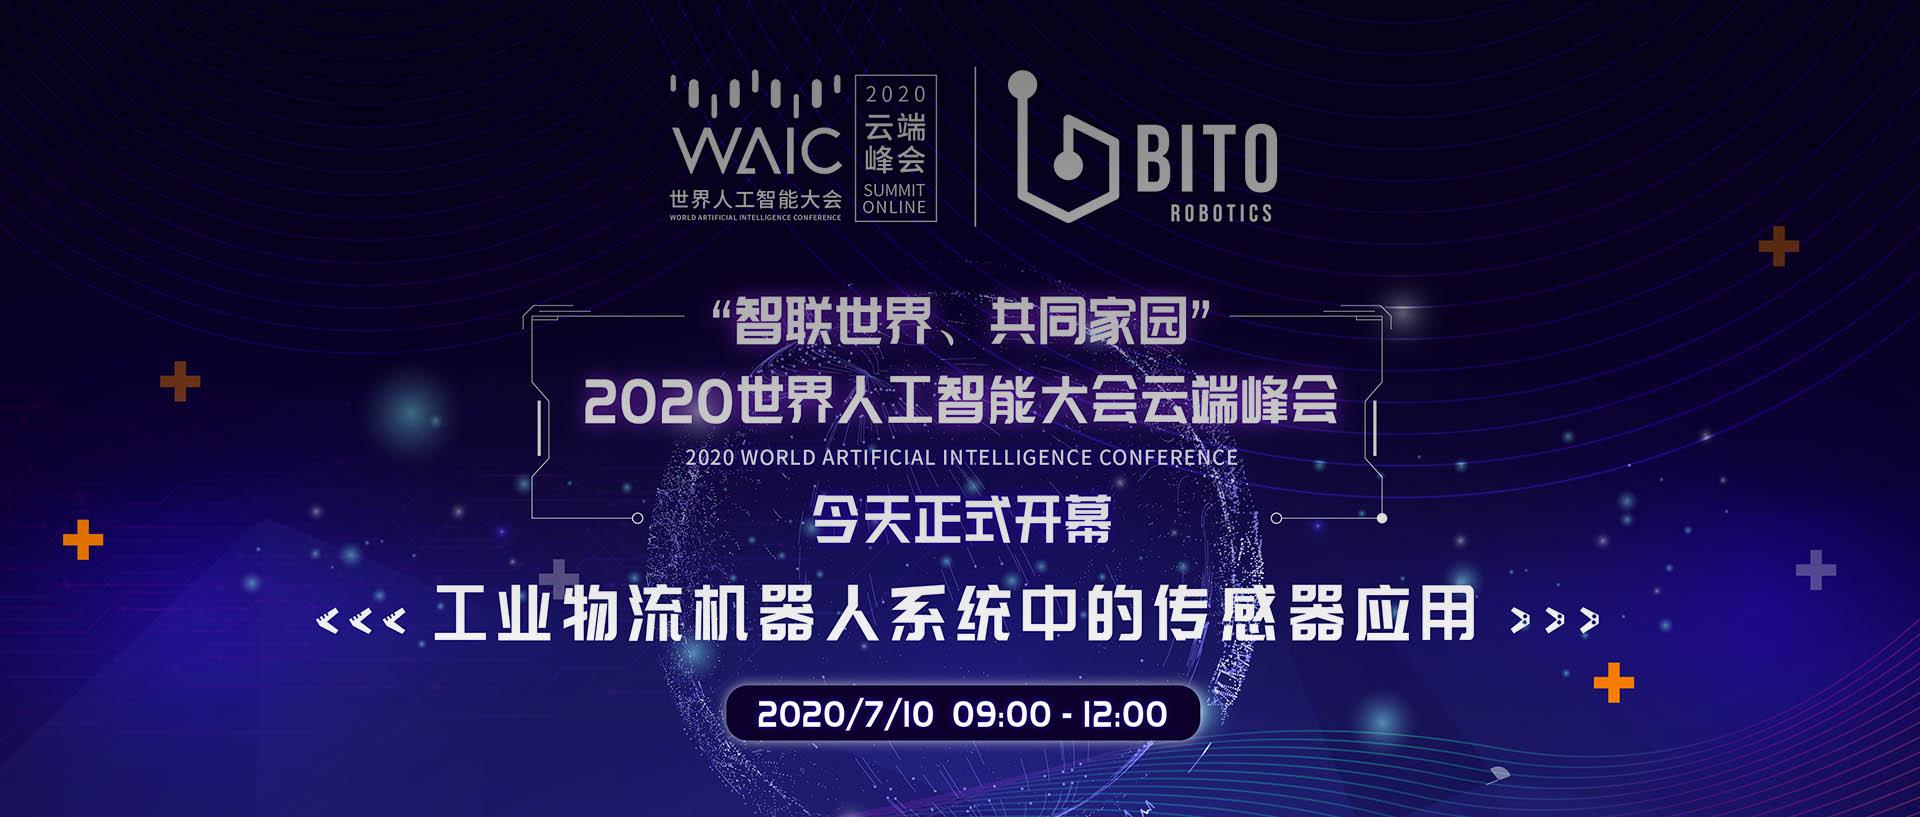 WAIC 世界人工智能大会大幕开启!BITO邀您进入智联新世界!